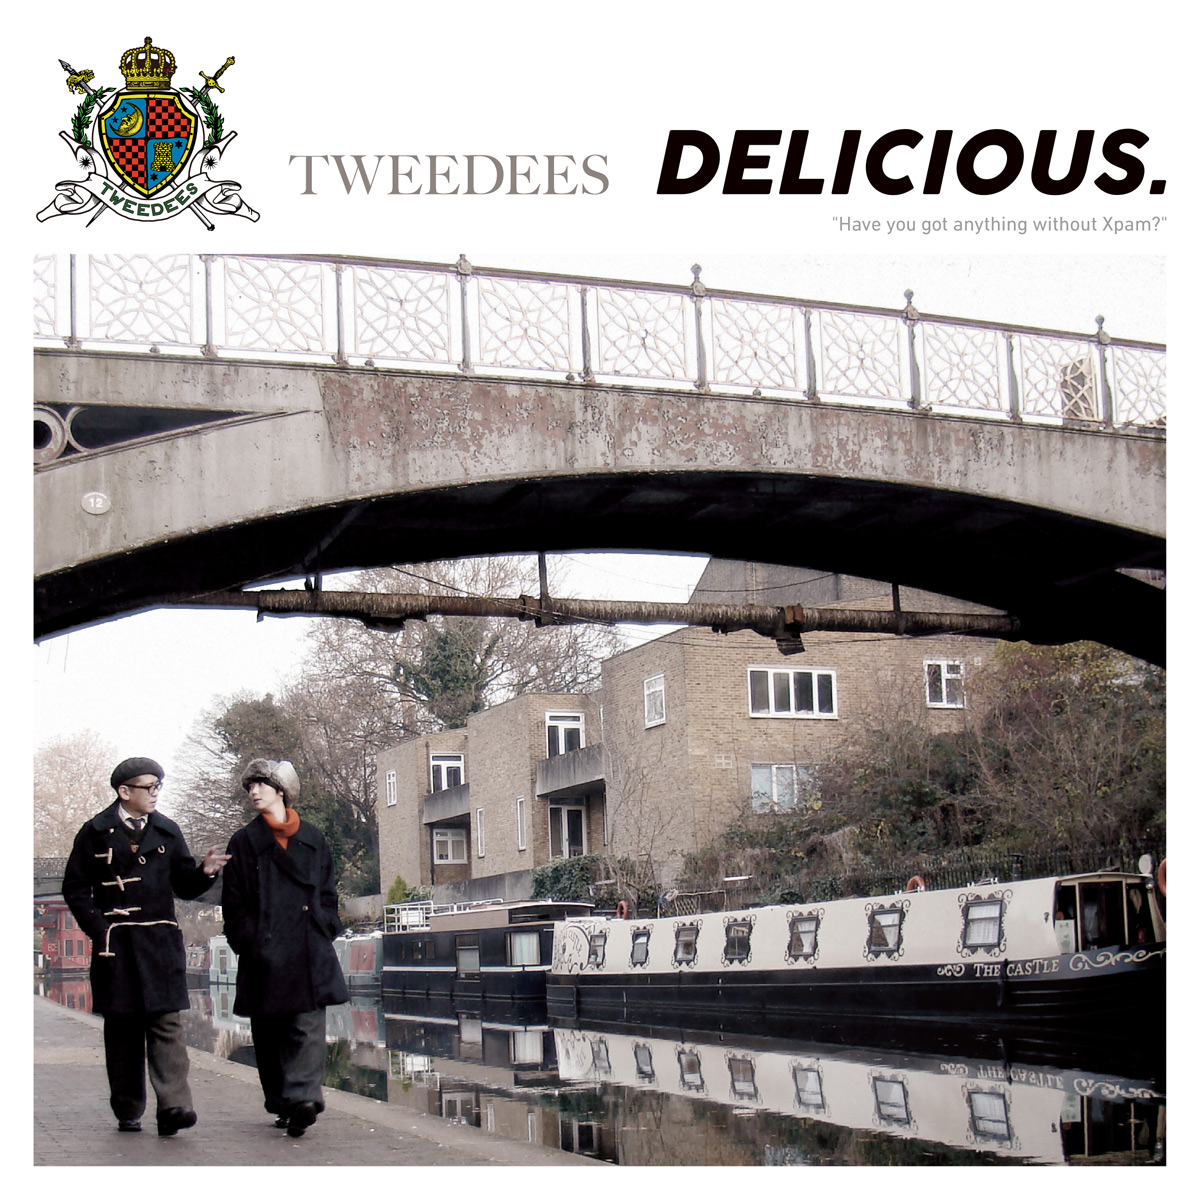 TWEEDEES、3rdアルバムの内容発表 ジャケットも公開サムネイル画像